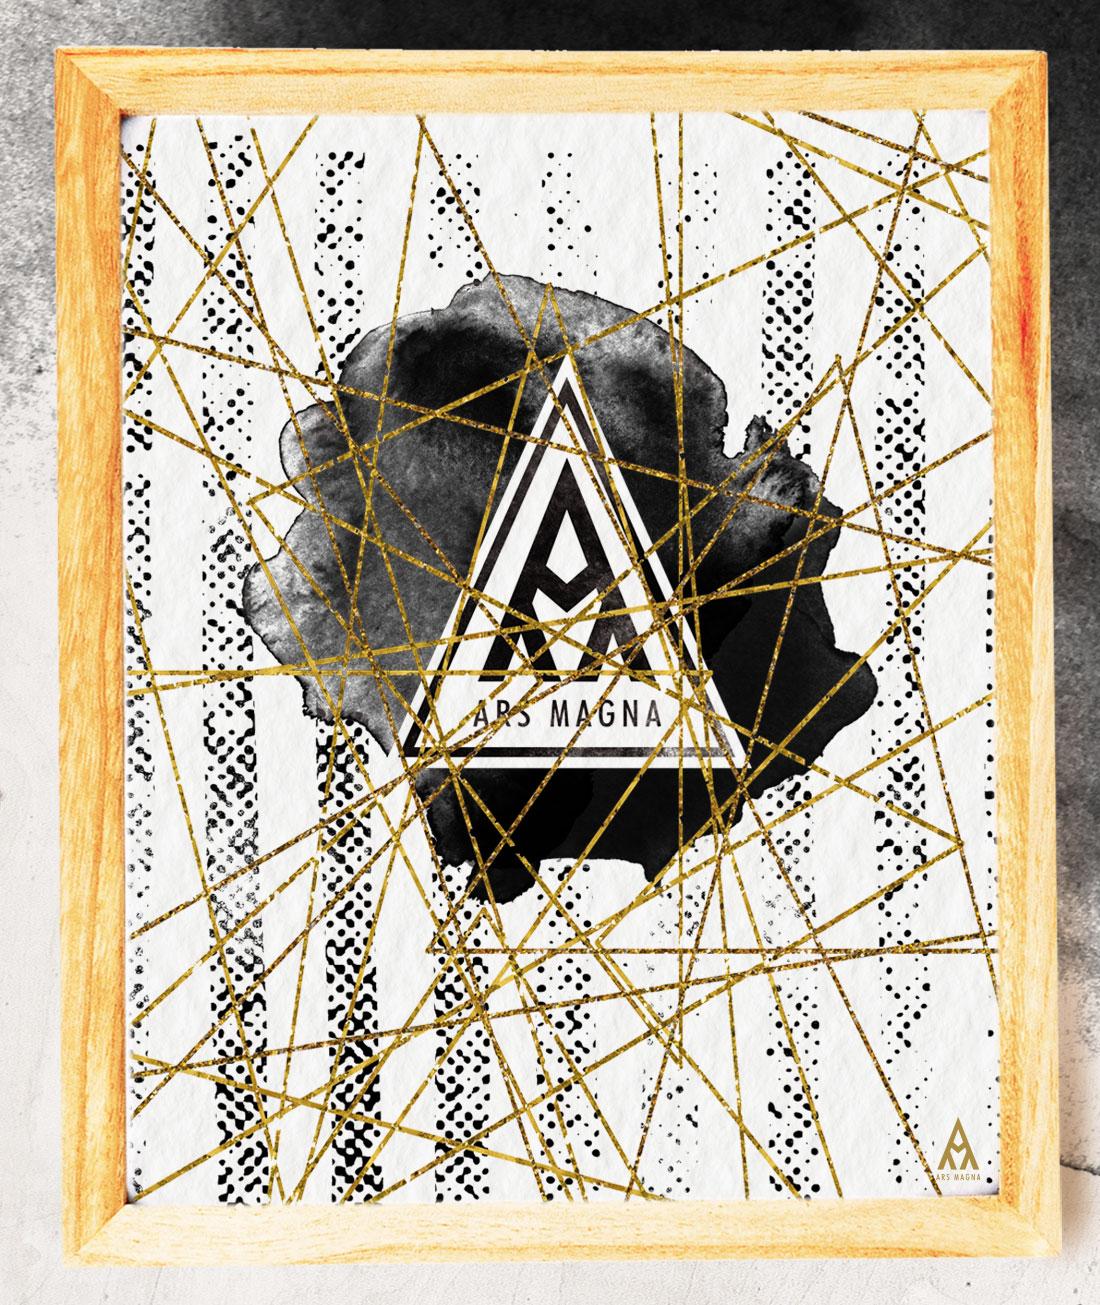 Ars Magna Design Watercolor Kunstdruck Motiv ShadesOfGold